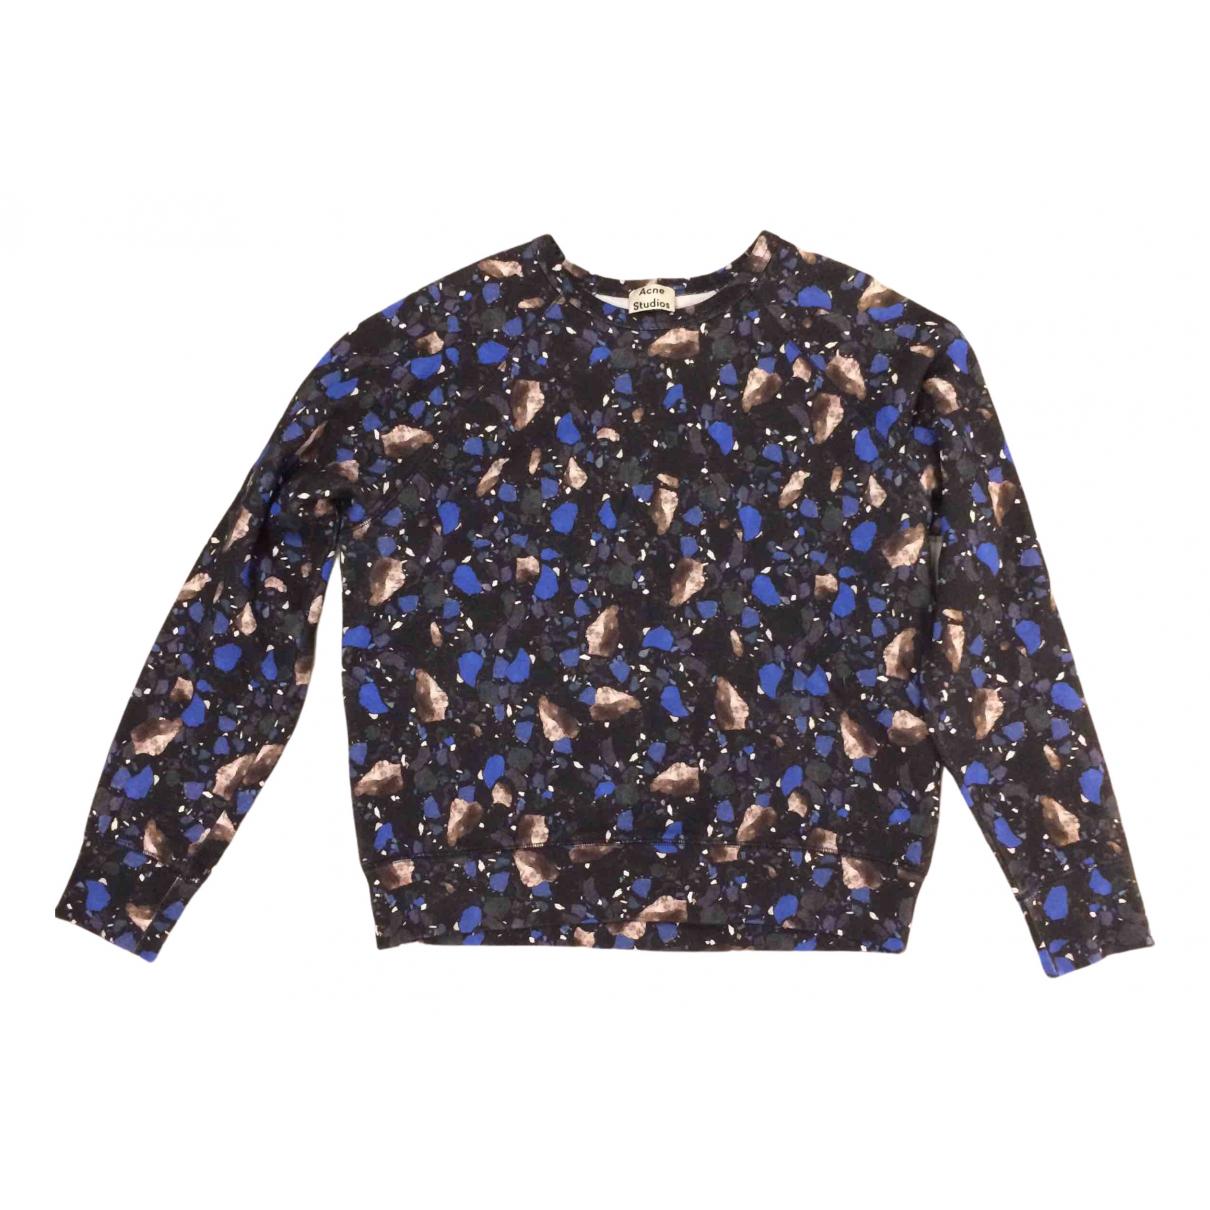 Acne Studios \N Multicolour Cotton Knitwear & Sweatshirts for Men L International